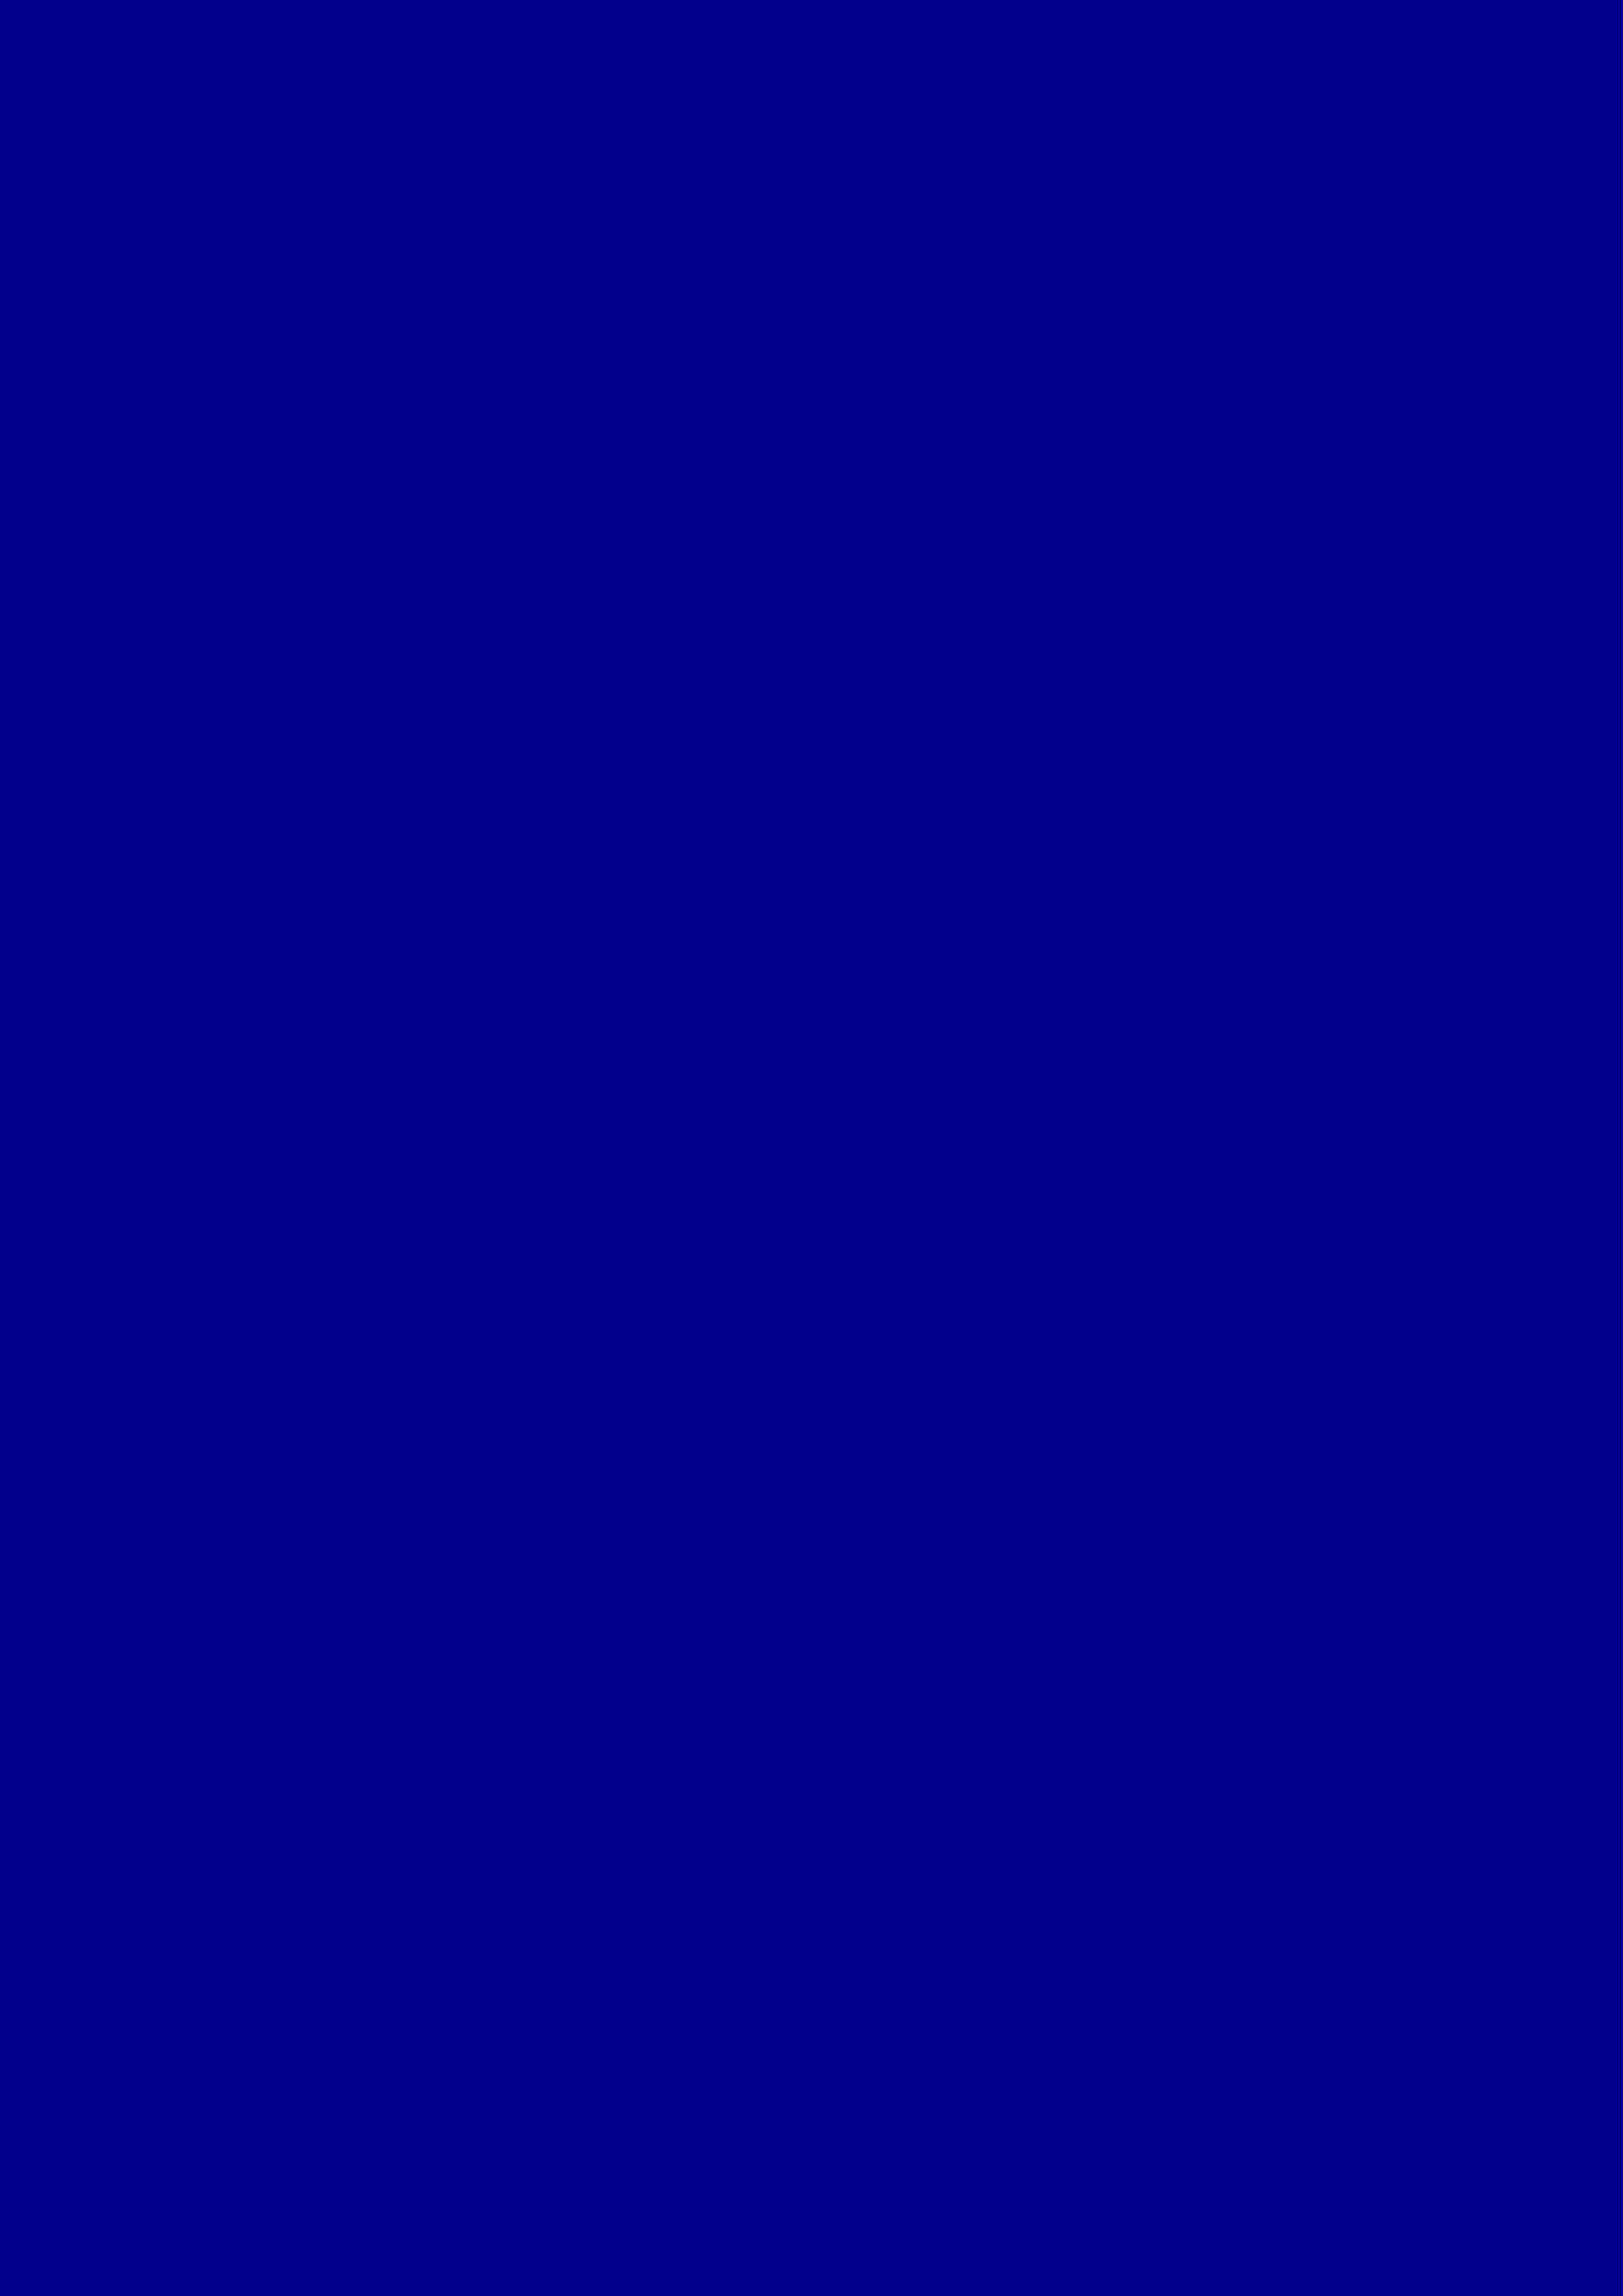 2480x3508 Dark Blue Solid Color Background